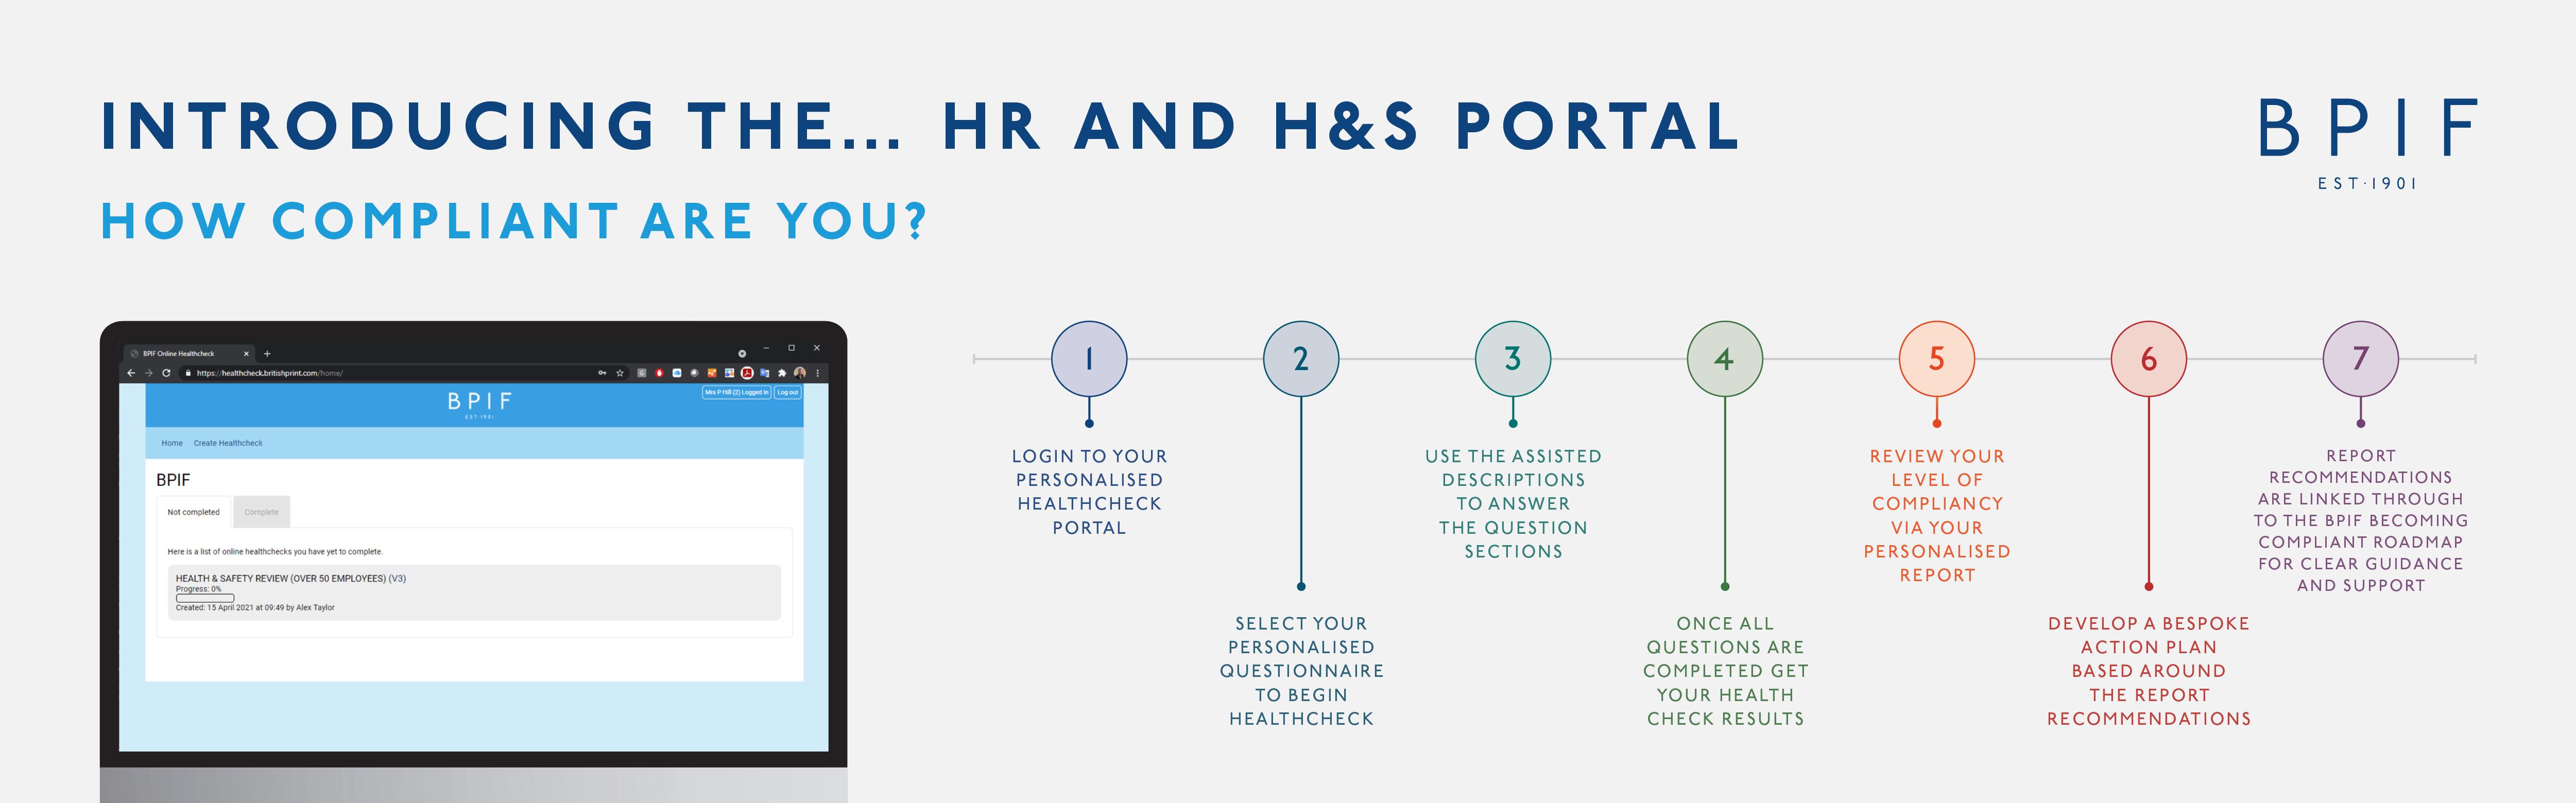 HR HS Portal Banner - Introducing